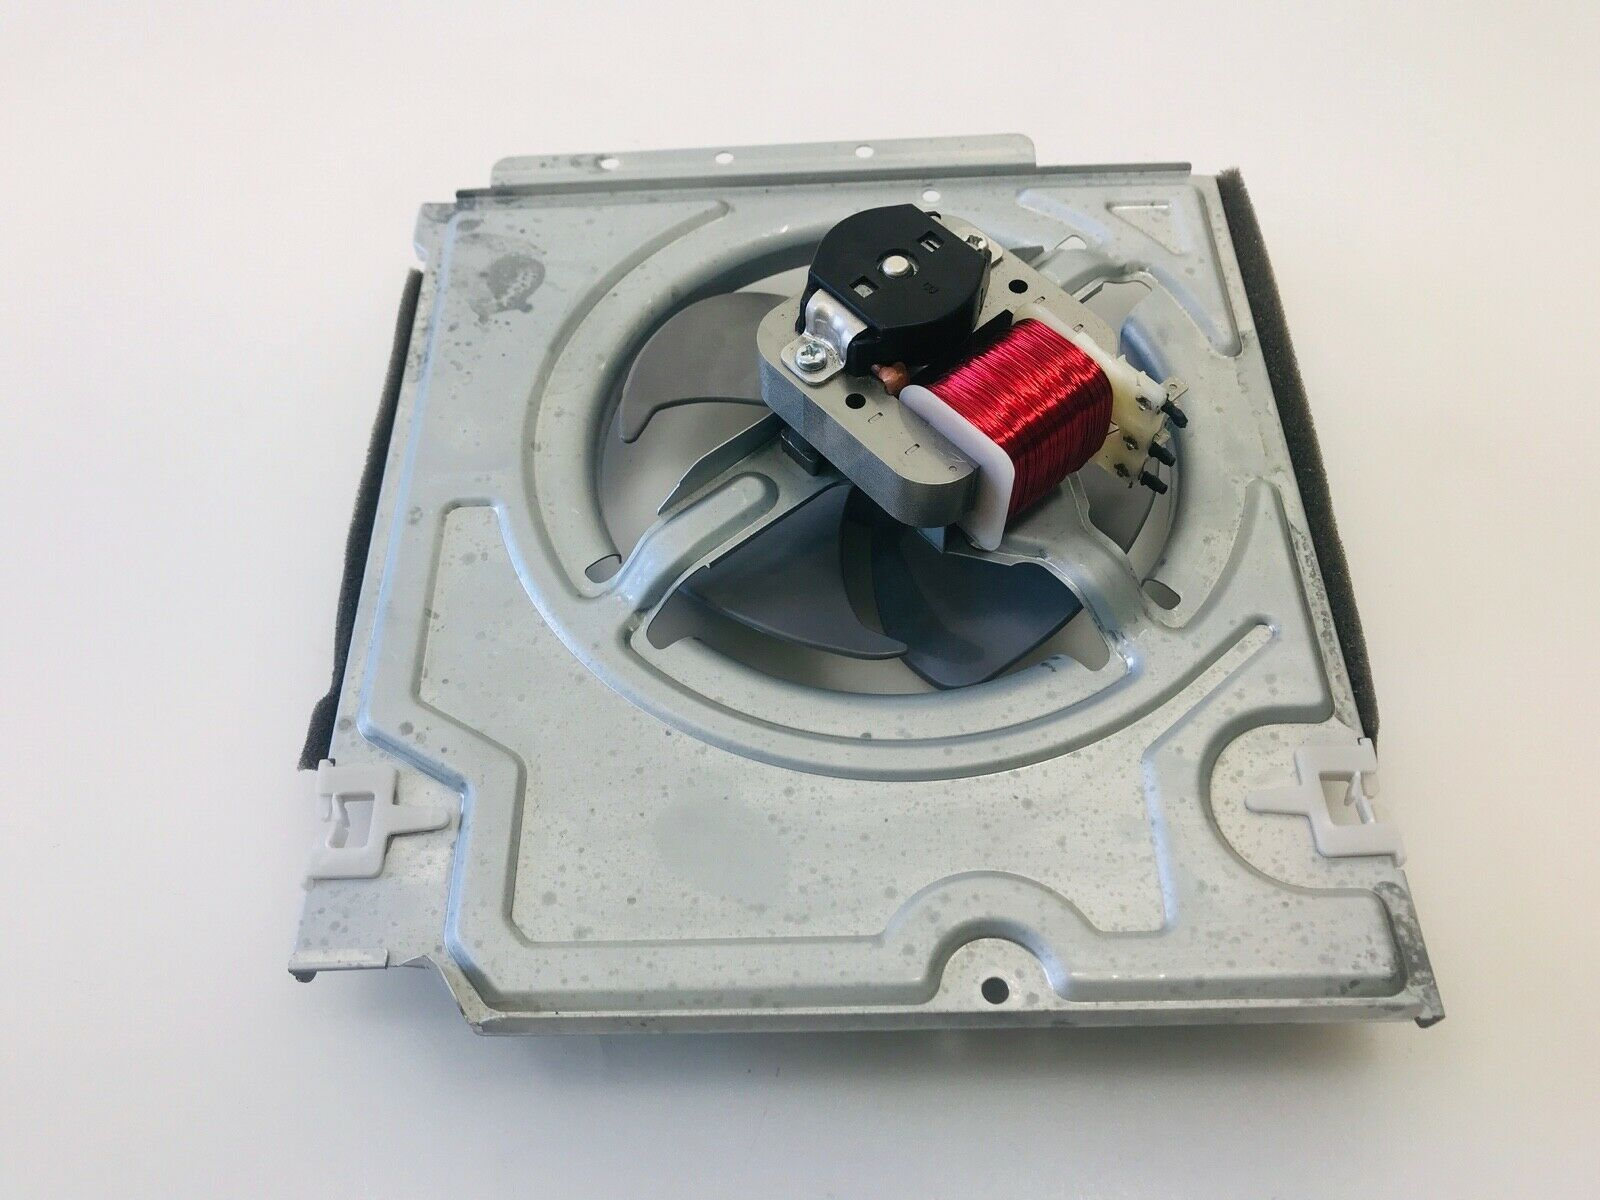 Samsung Microwave Cooling Fan Motor w/Blade & Housing DE31-00045B DE31-00064A image 3